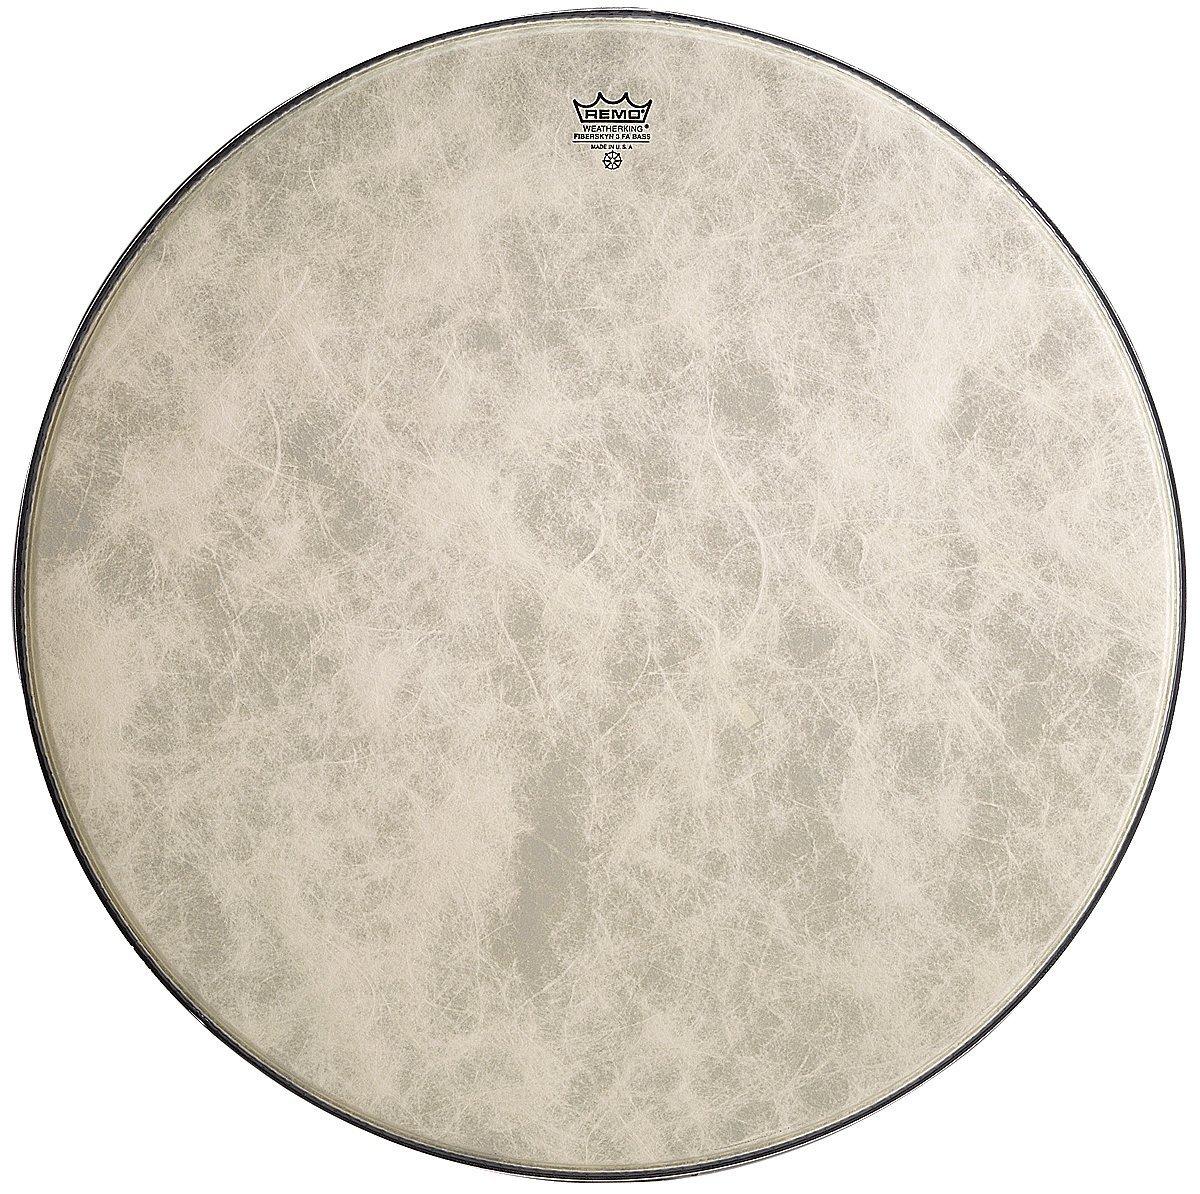 Remo FA1520-00 20-Inch Fiberskyn 3 Ambassador Bass Drum Head